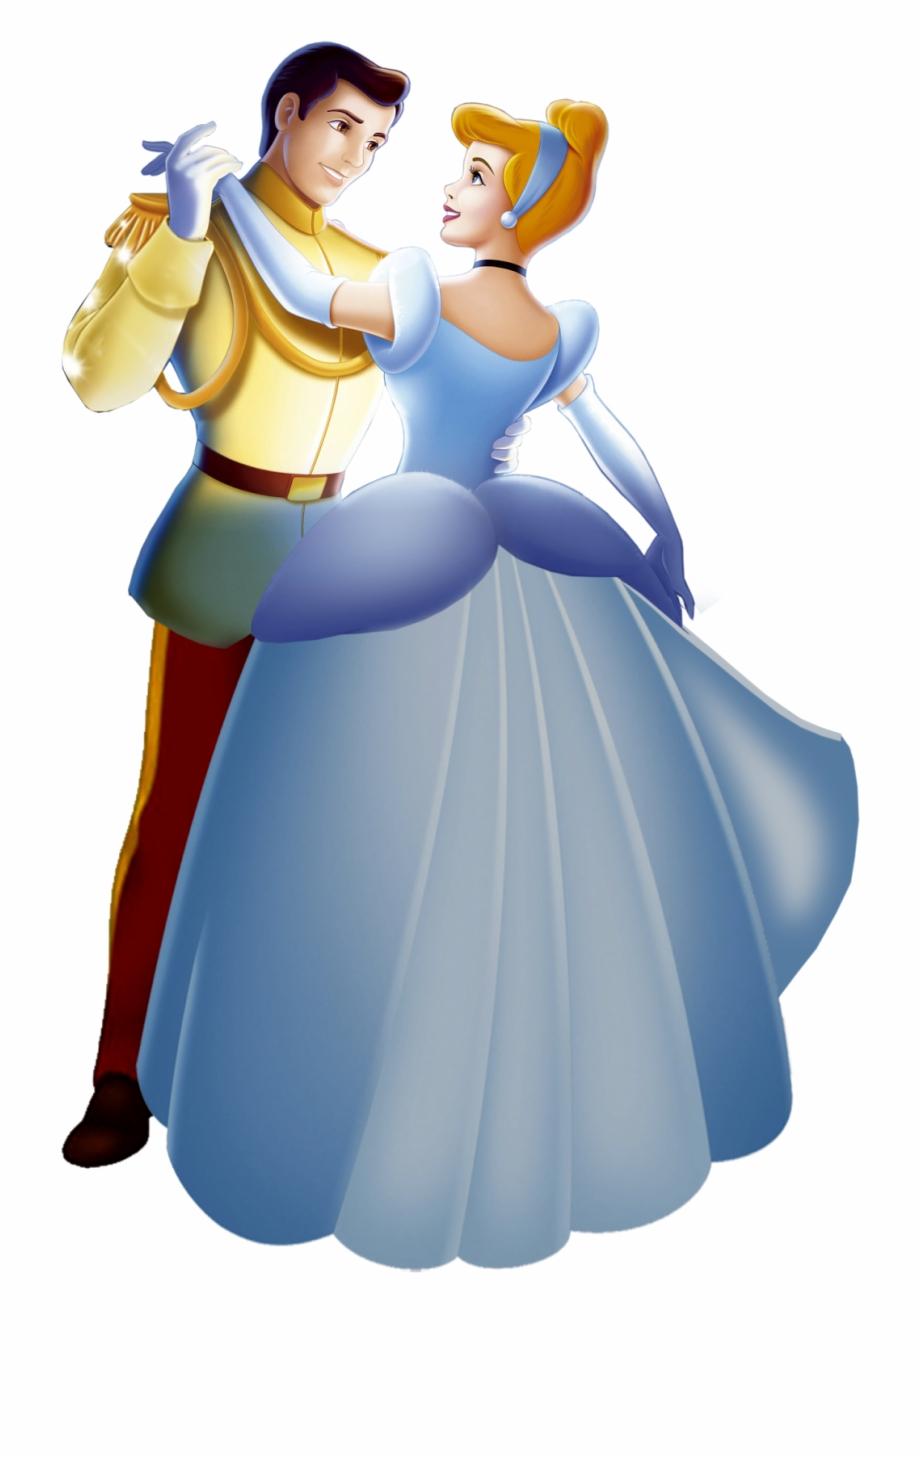 Cinderella clipart cinderella theme. Transparent png